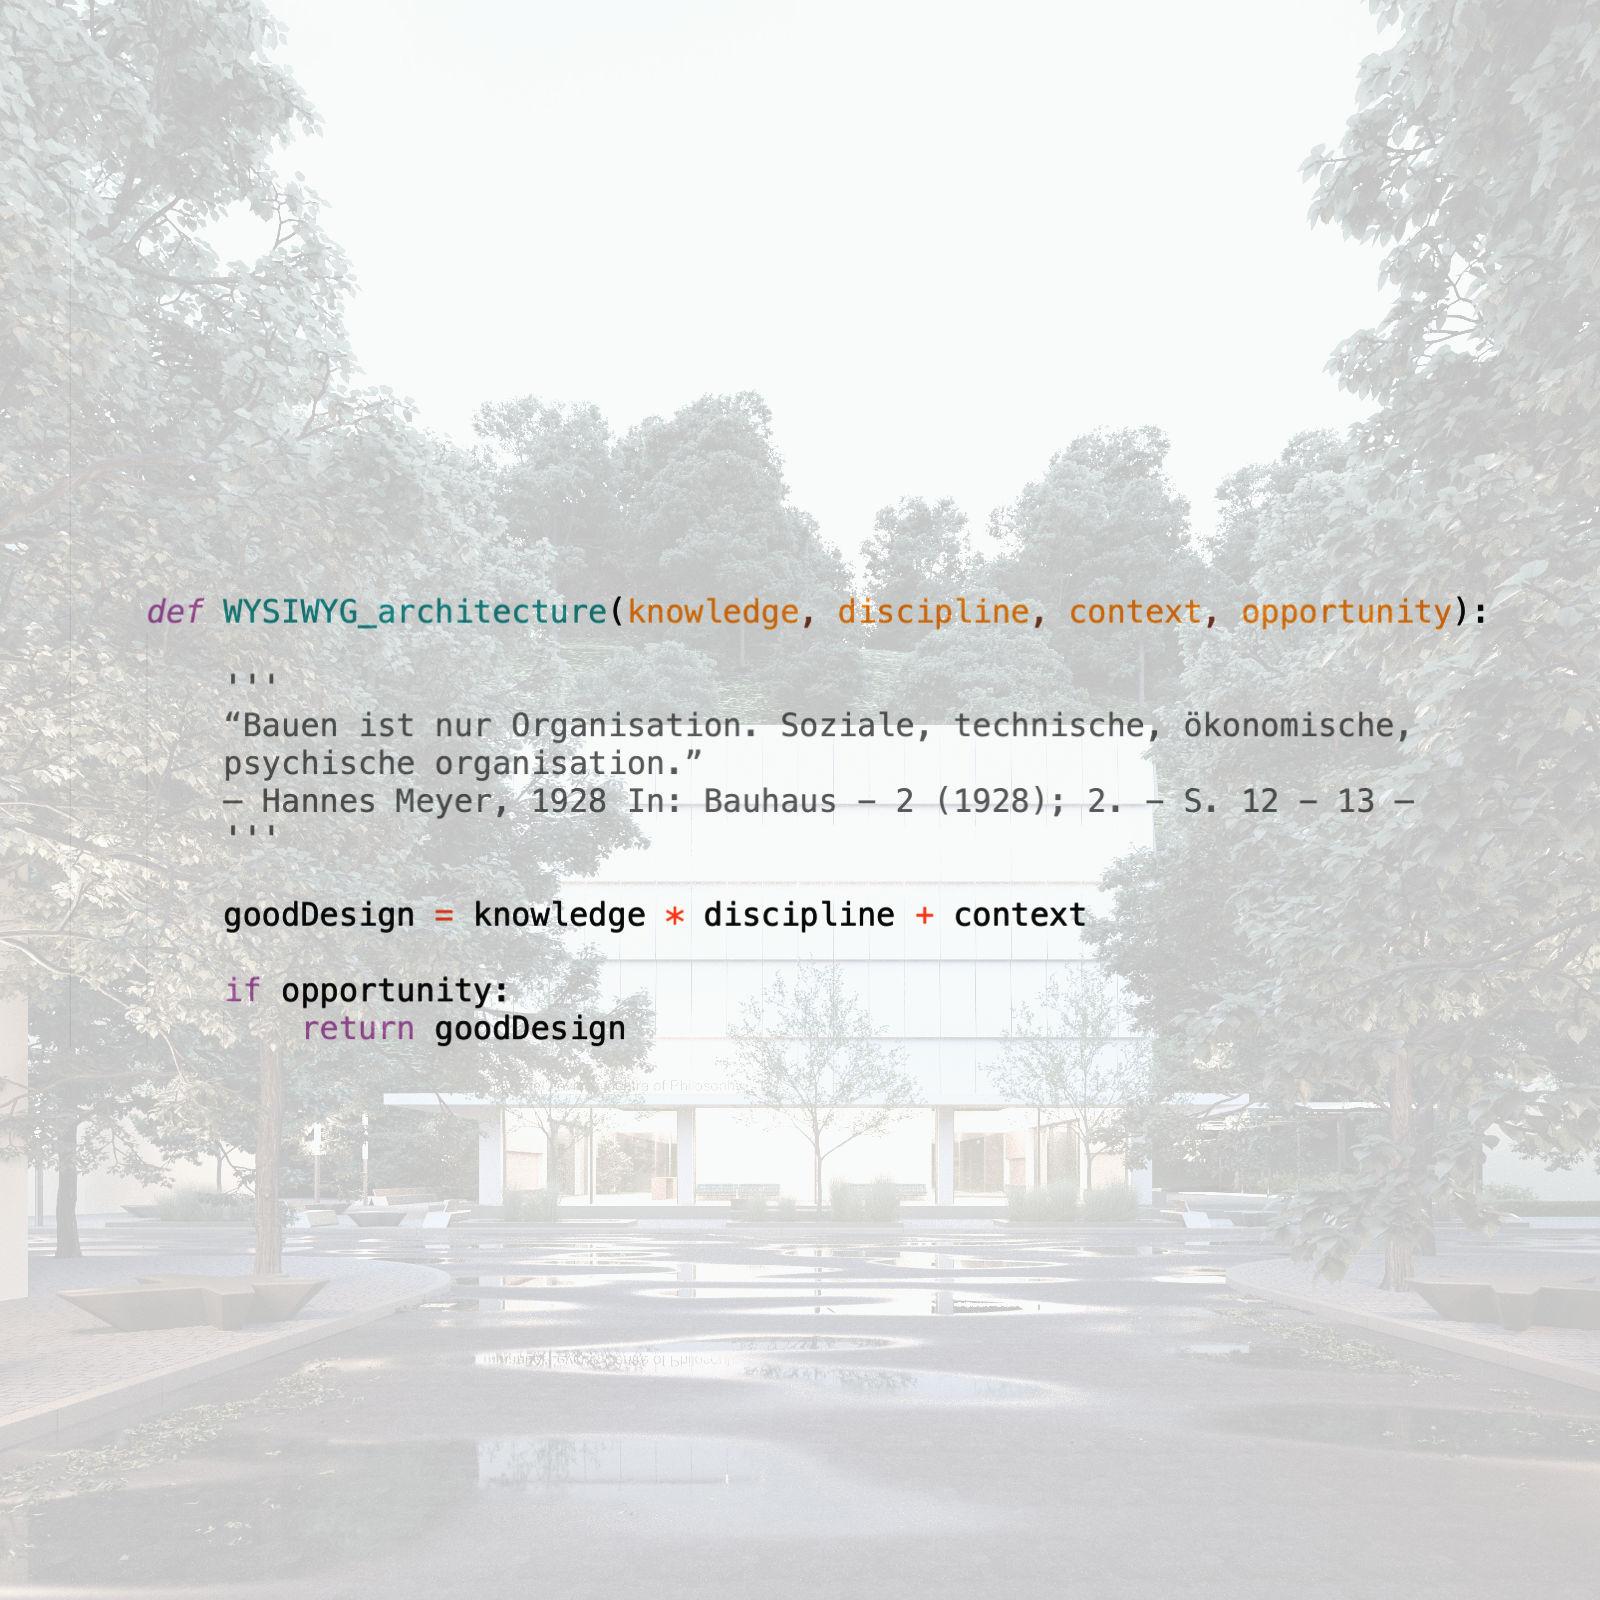 WYSIWYG architecture